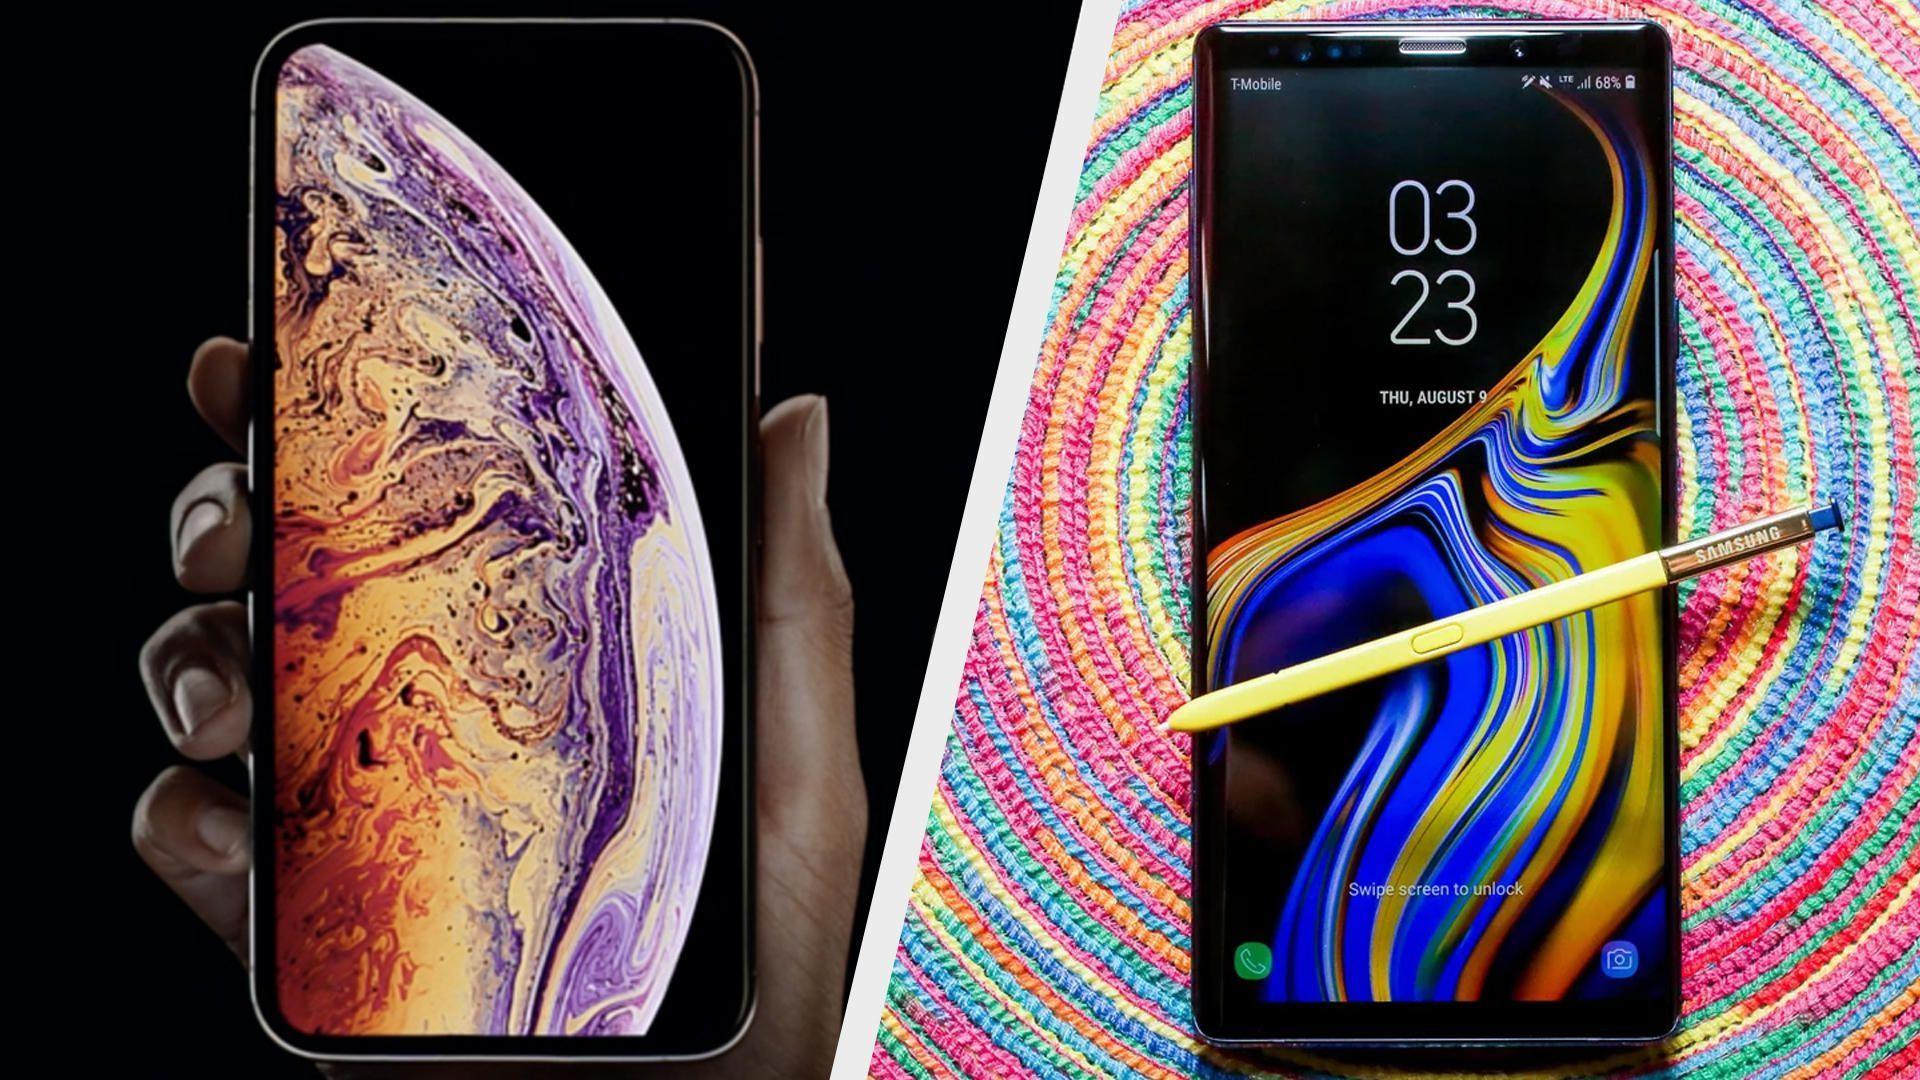 Apple In Yeni Amiral Gemisi Akilli Telefon Modeli Iphone Xs Max Cok Ciddi Sistem Degisiklikleriyle Beraber Gelmis Durumda Ac Galaxy Note 9 Galaxy Note Note 9